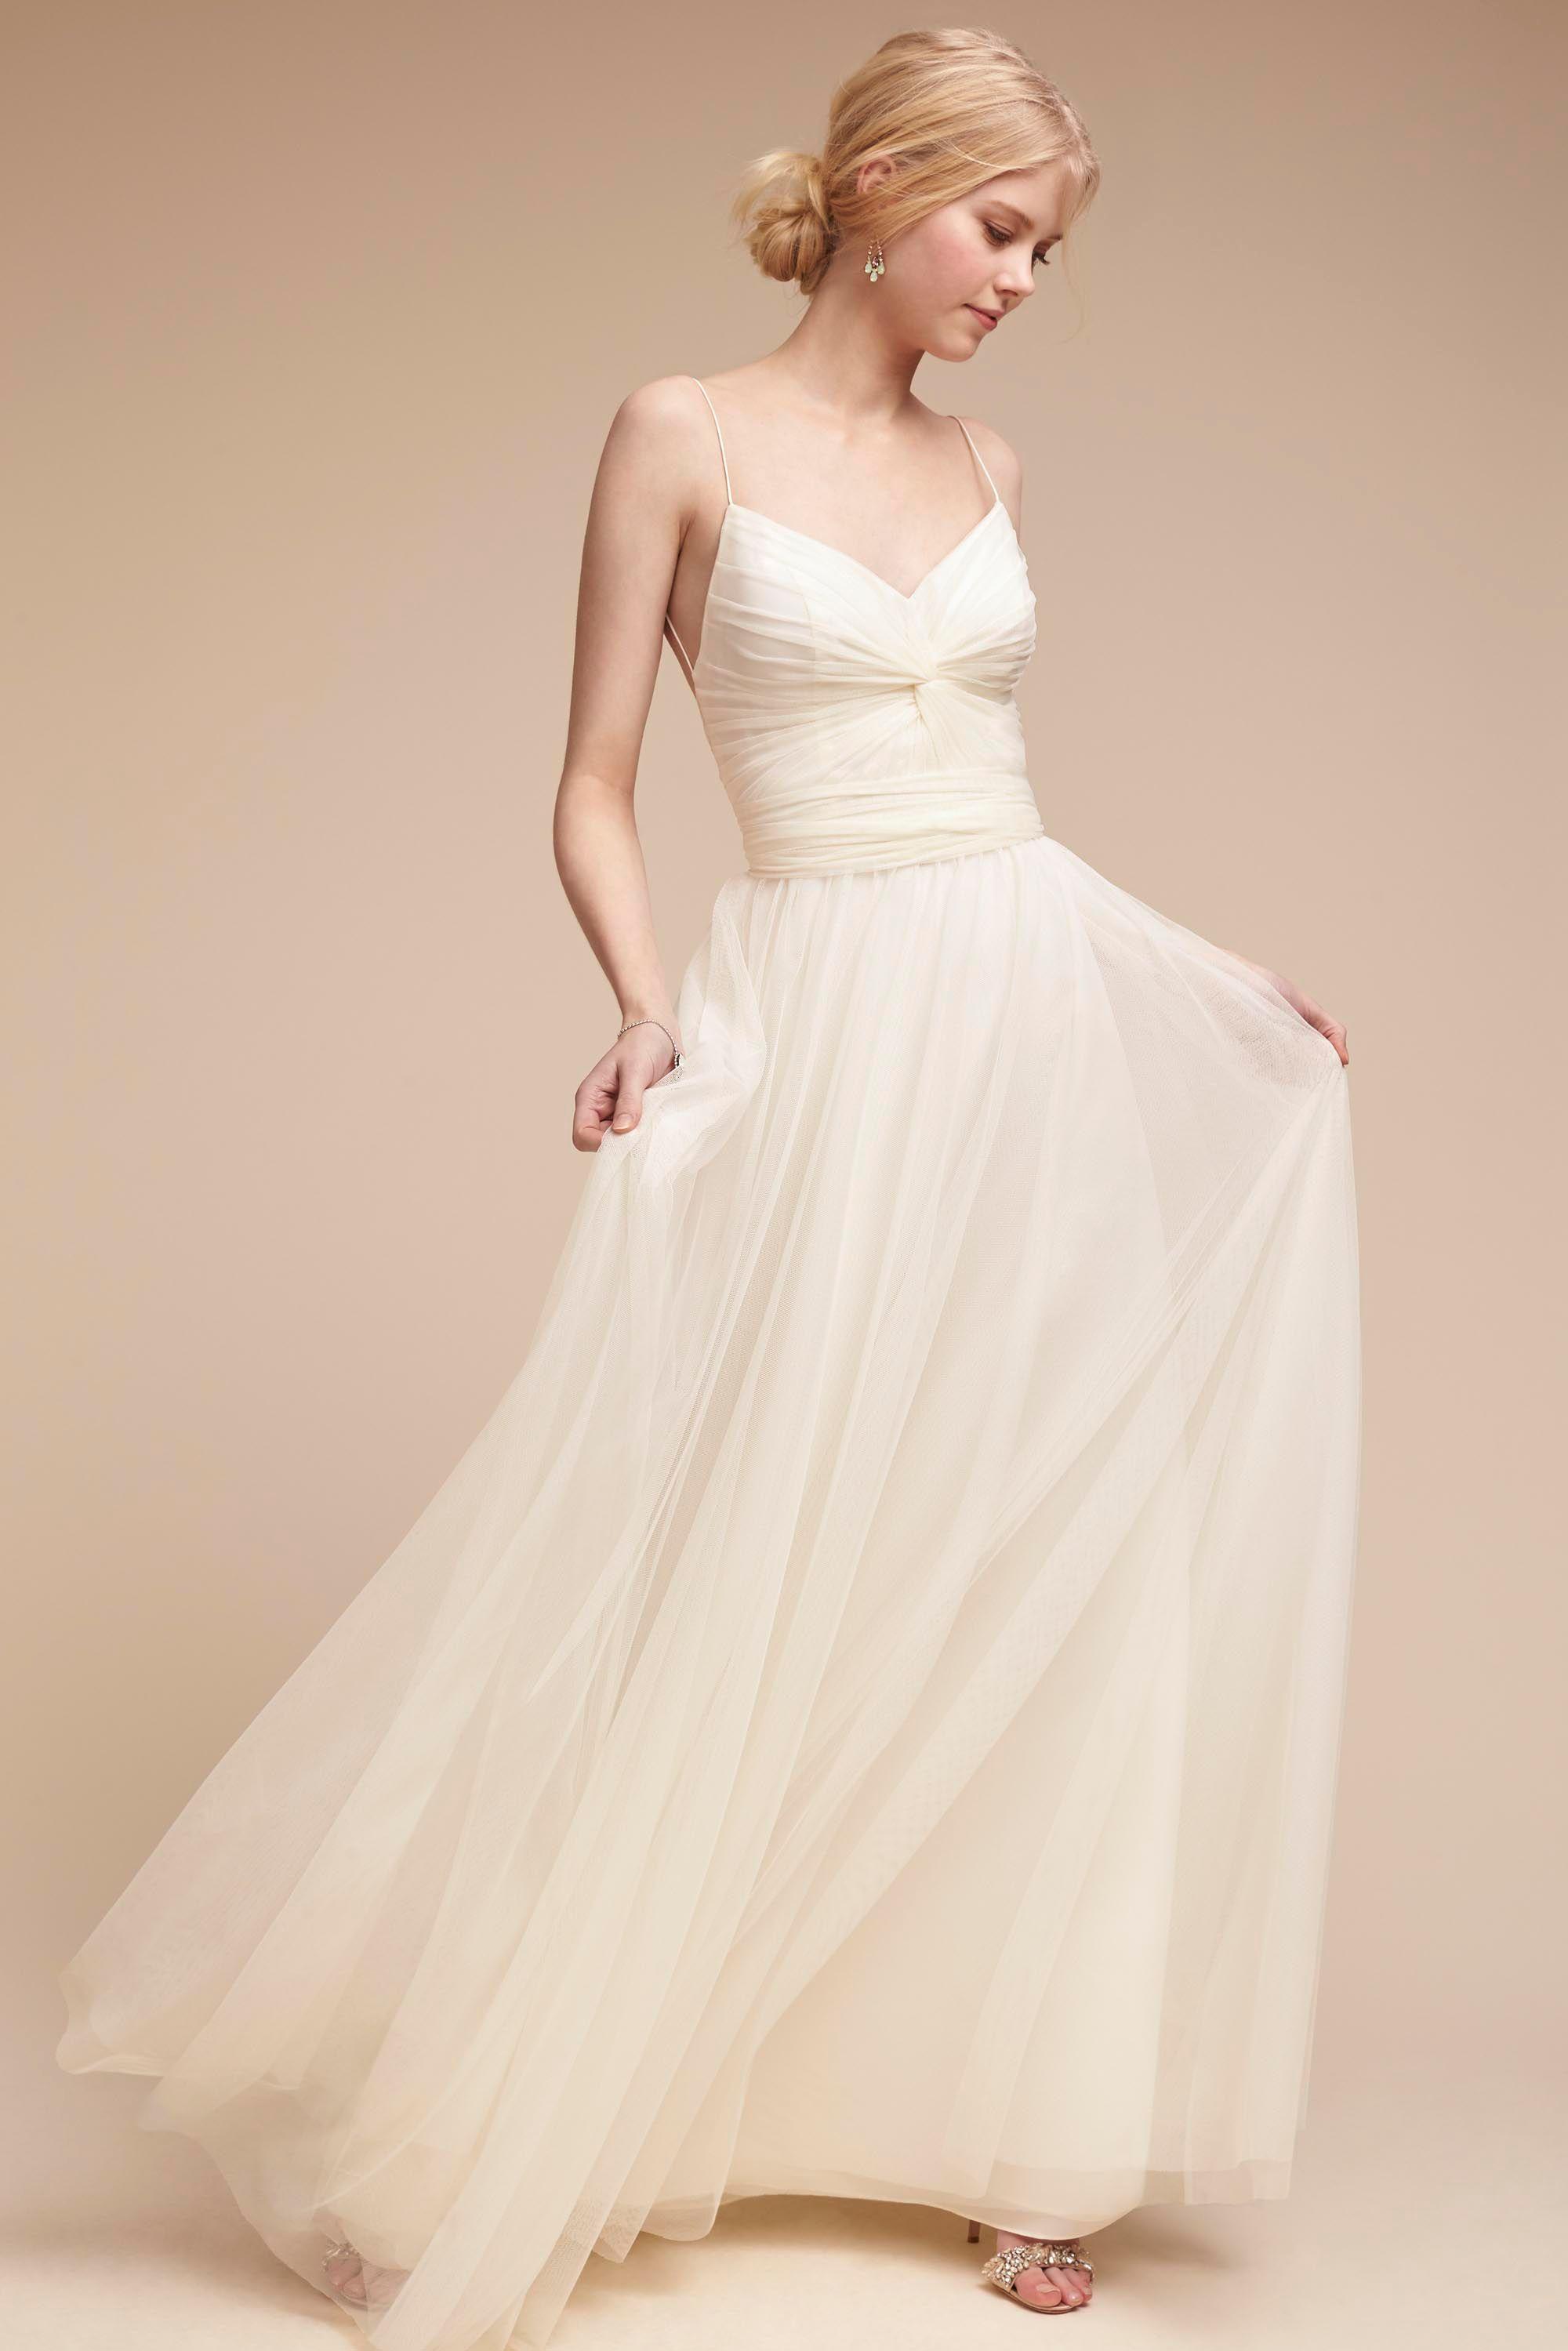 Little White Dresses Jumpsuits Bhldn